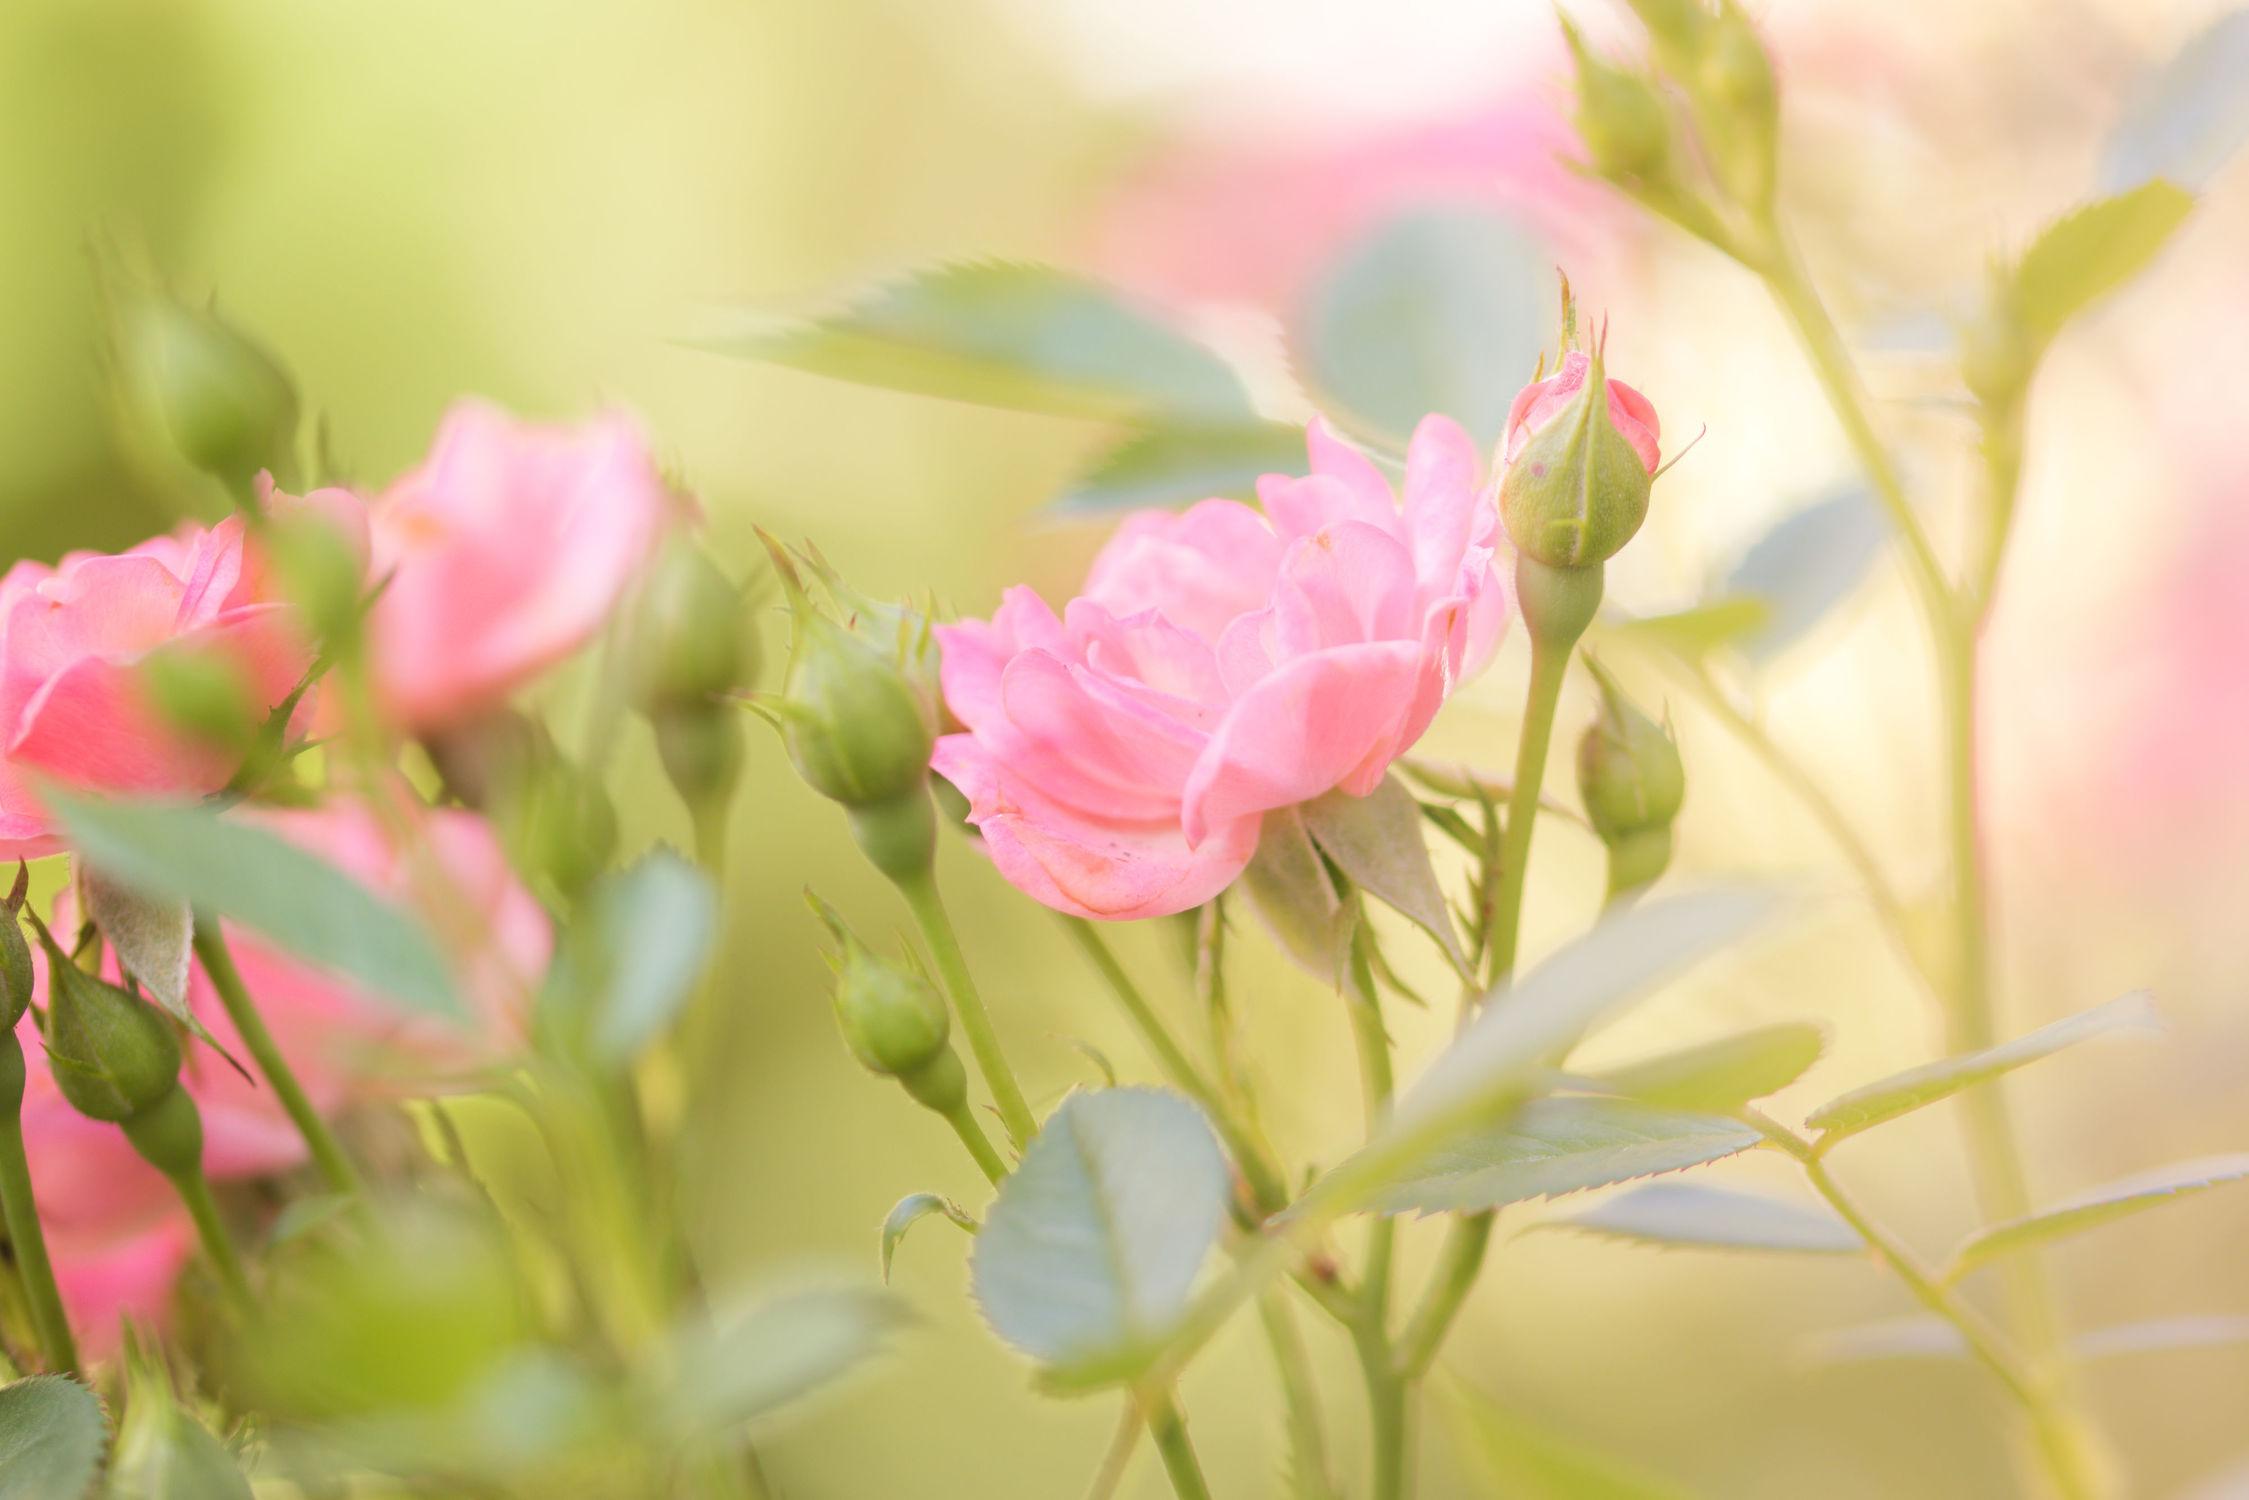 Bild mit Natur, Pflanzen, Blumen, Rosen, Blume, Pflanze, Rose, Flower, Flowers, Gartenrosen, DagmarGiers, Dagmarmarina